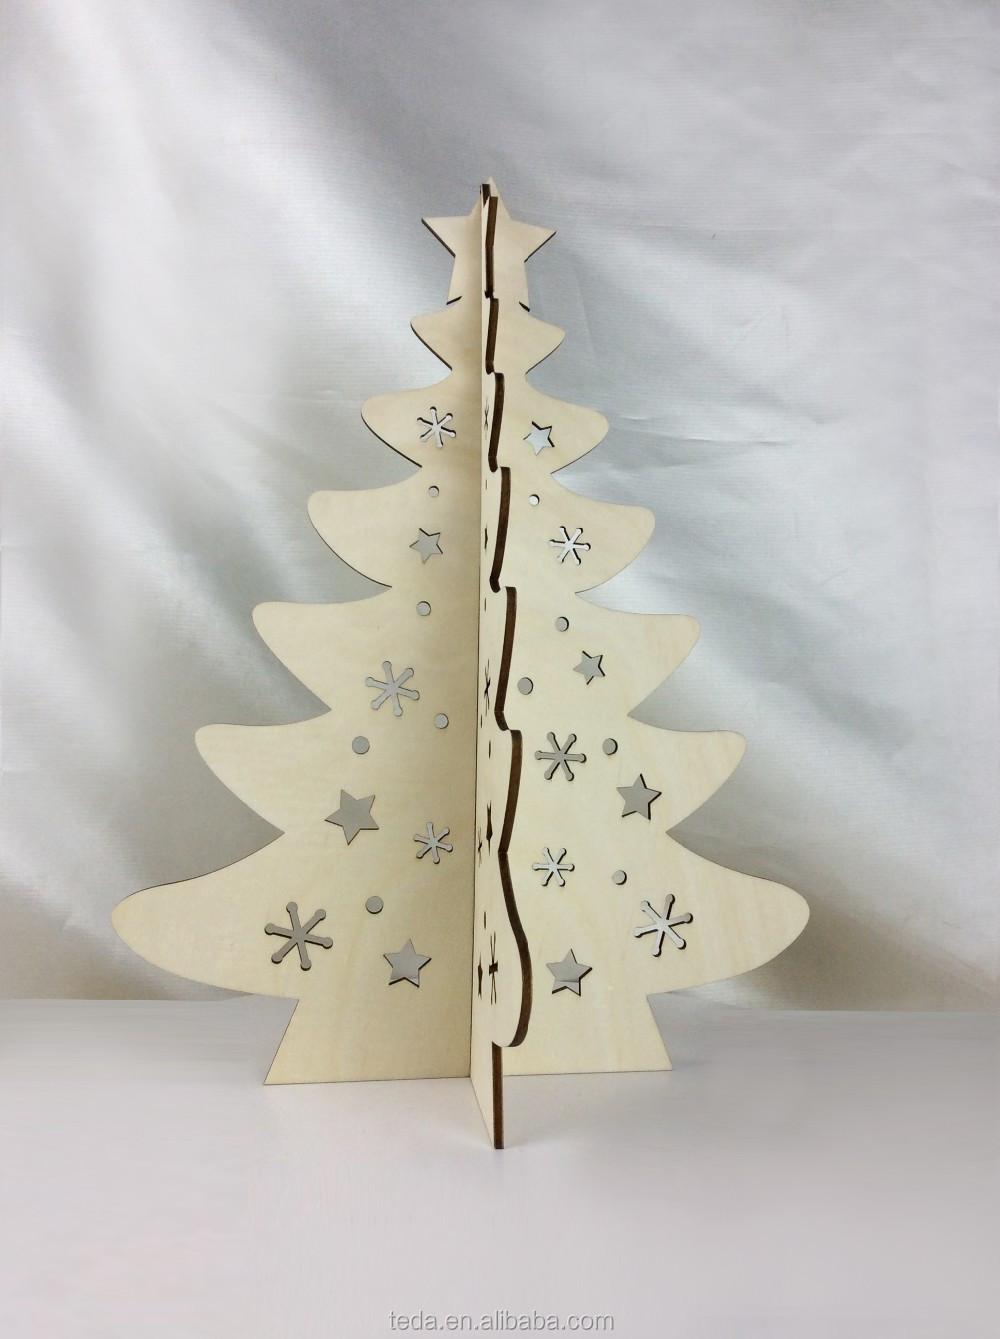 Wooden Christmas Tree Stand On Table Buy Wood Christmas Tree